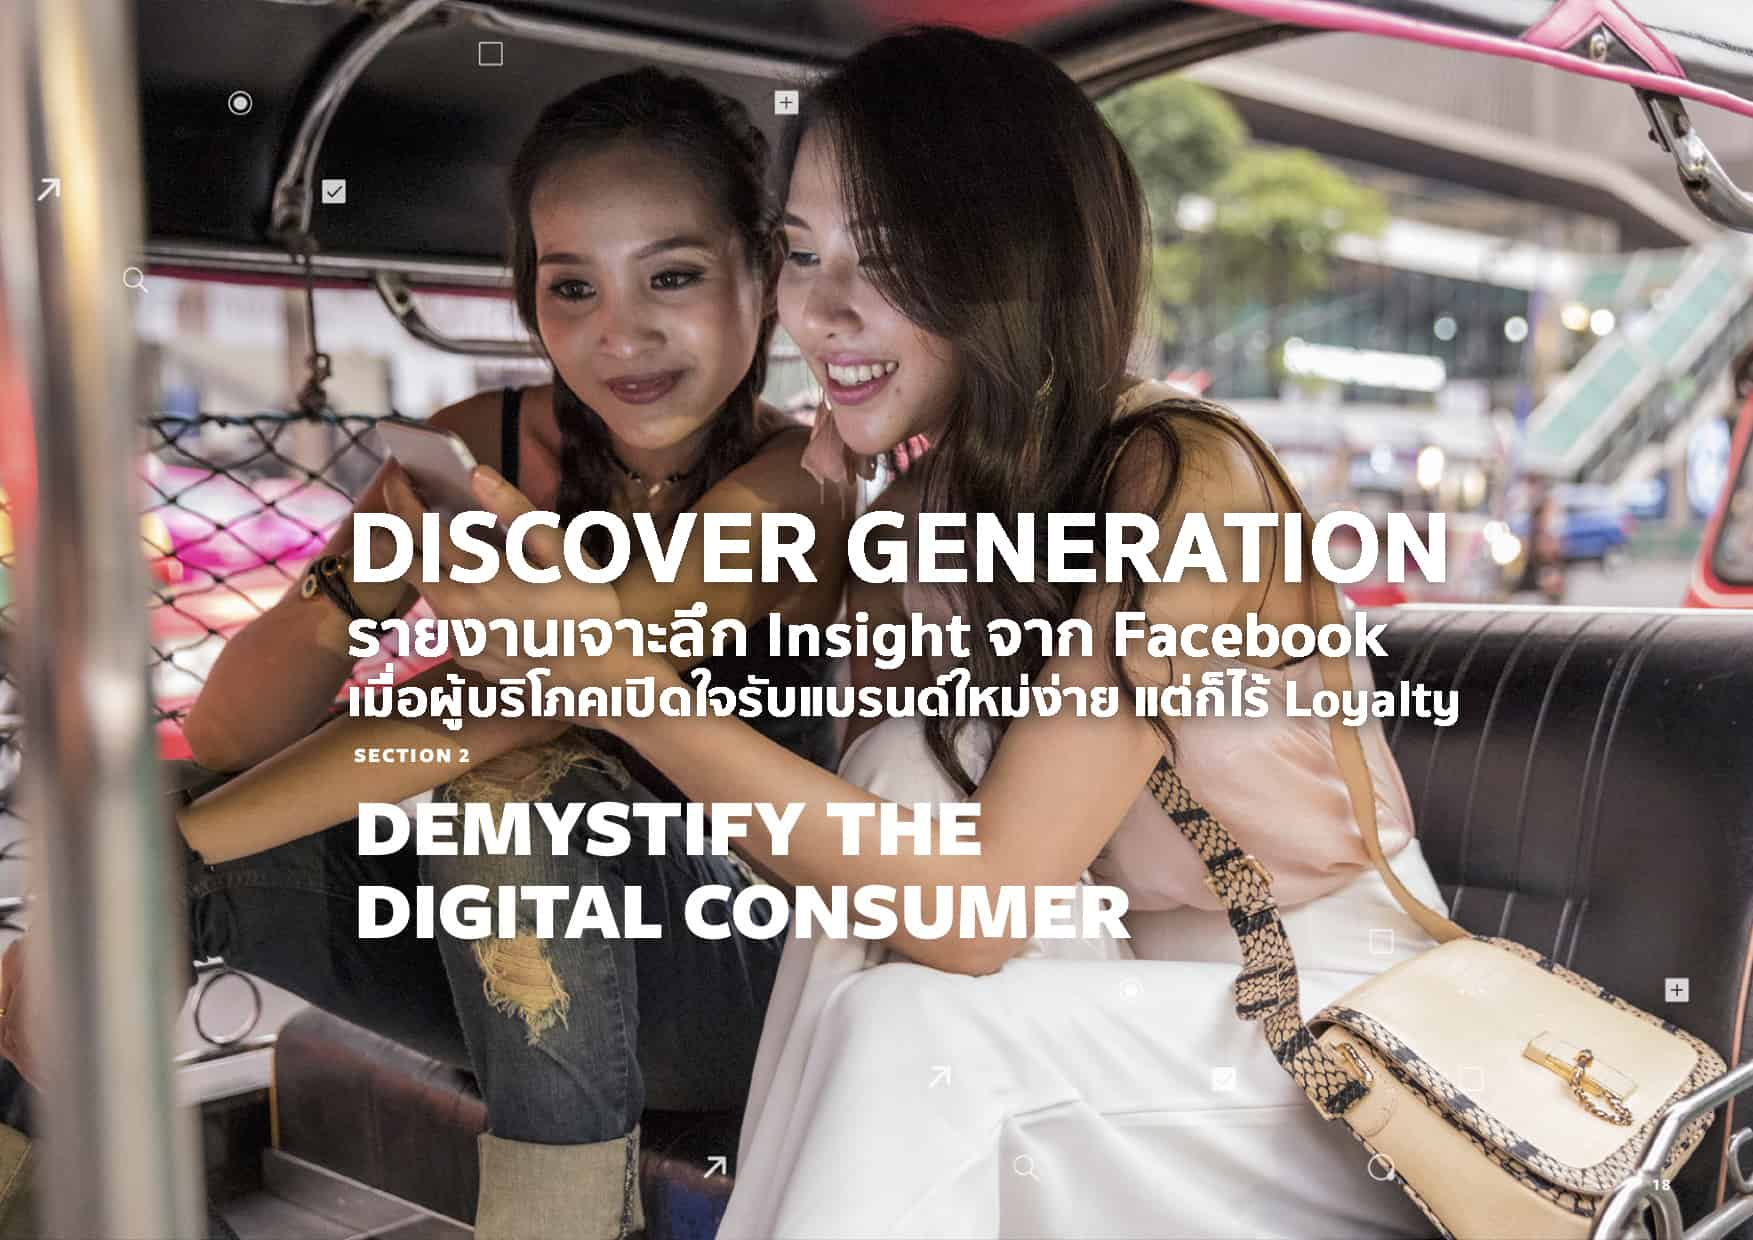 Discovery Generation เผย Insight ใหม่ คนไทยเปิดใจรับแบรนด์ใหม่ง่ายมาก